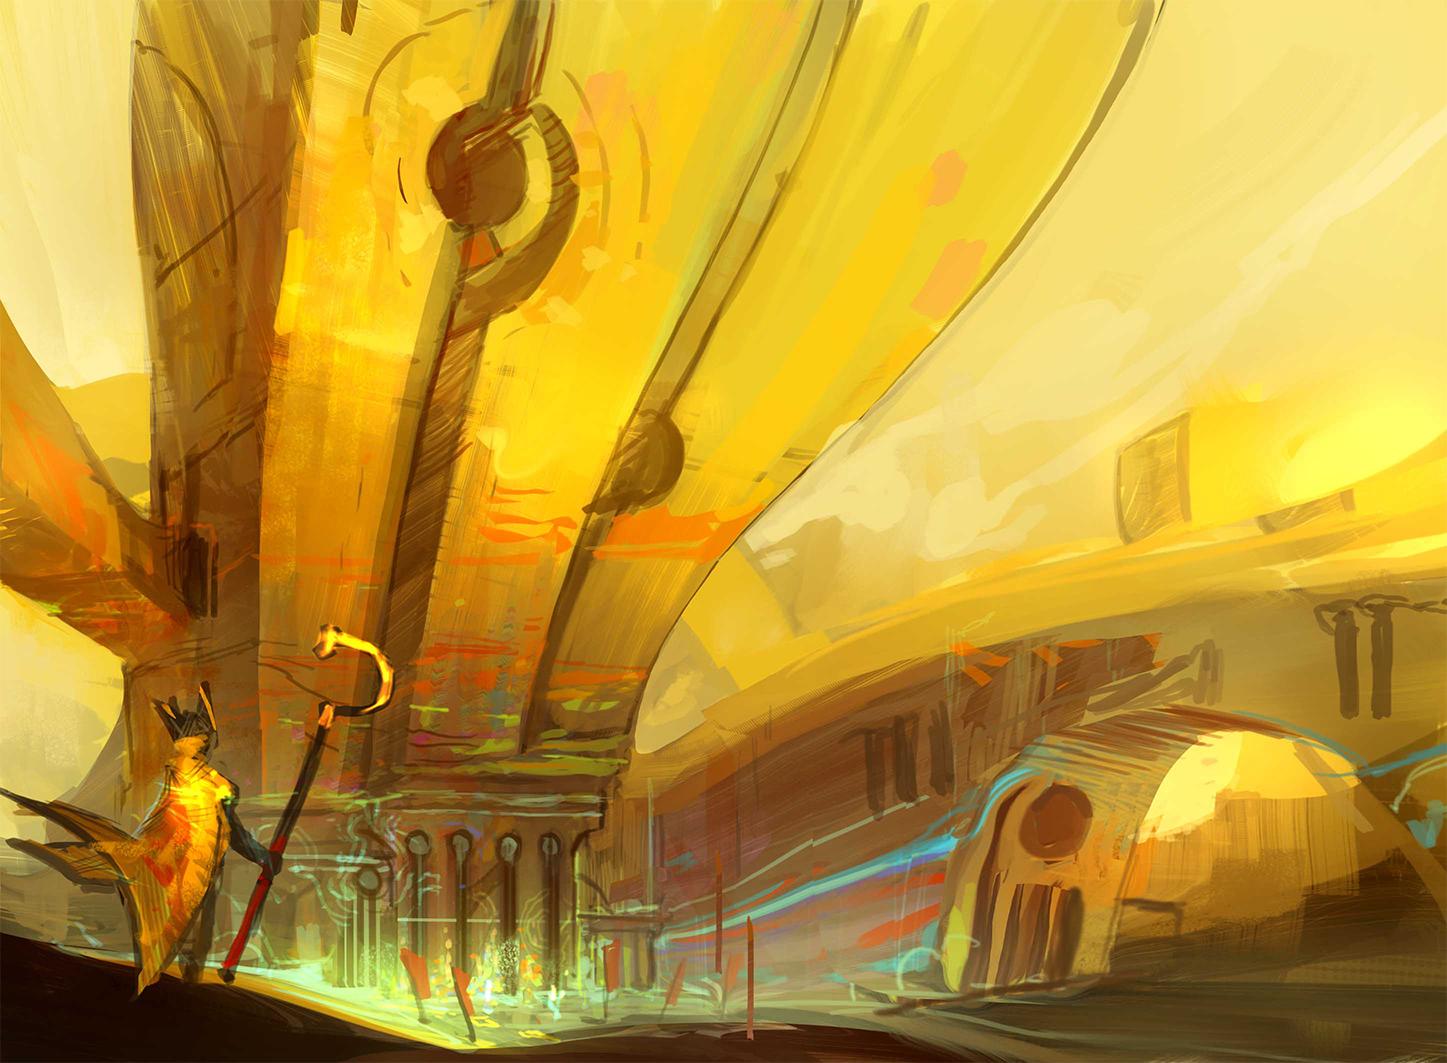 yellowboard2.jpg